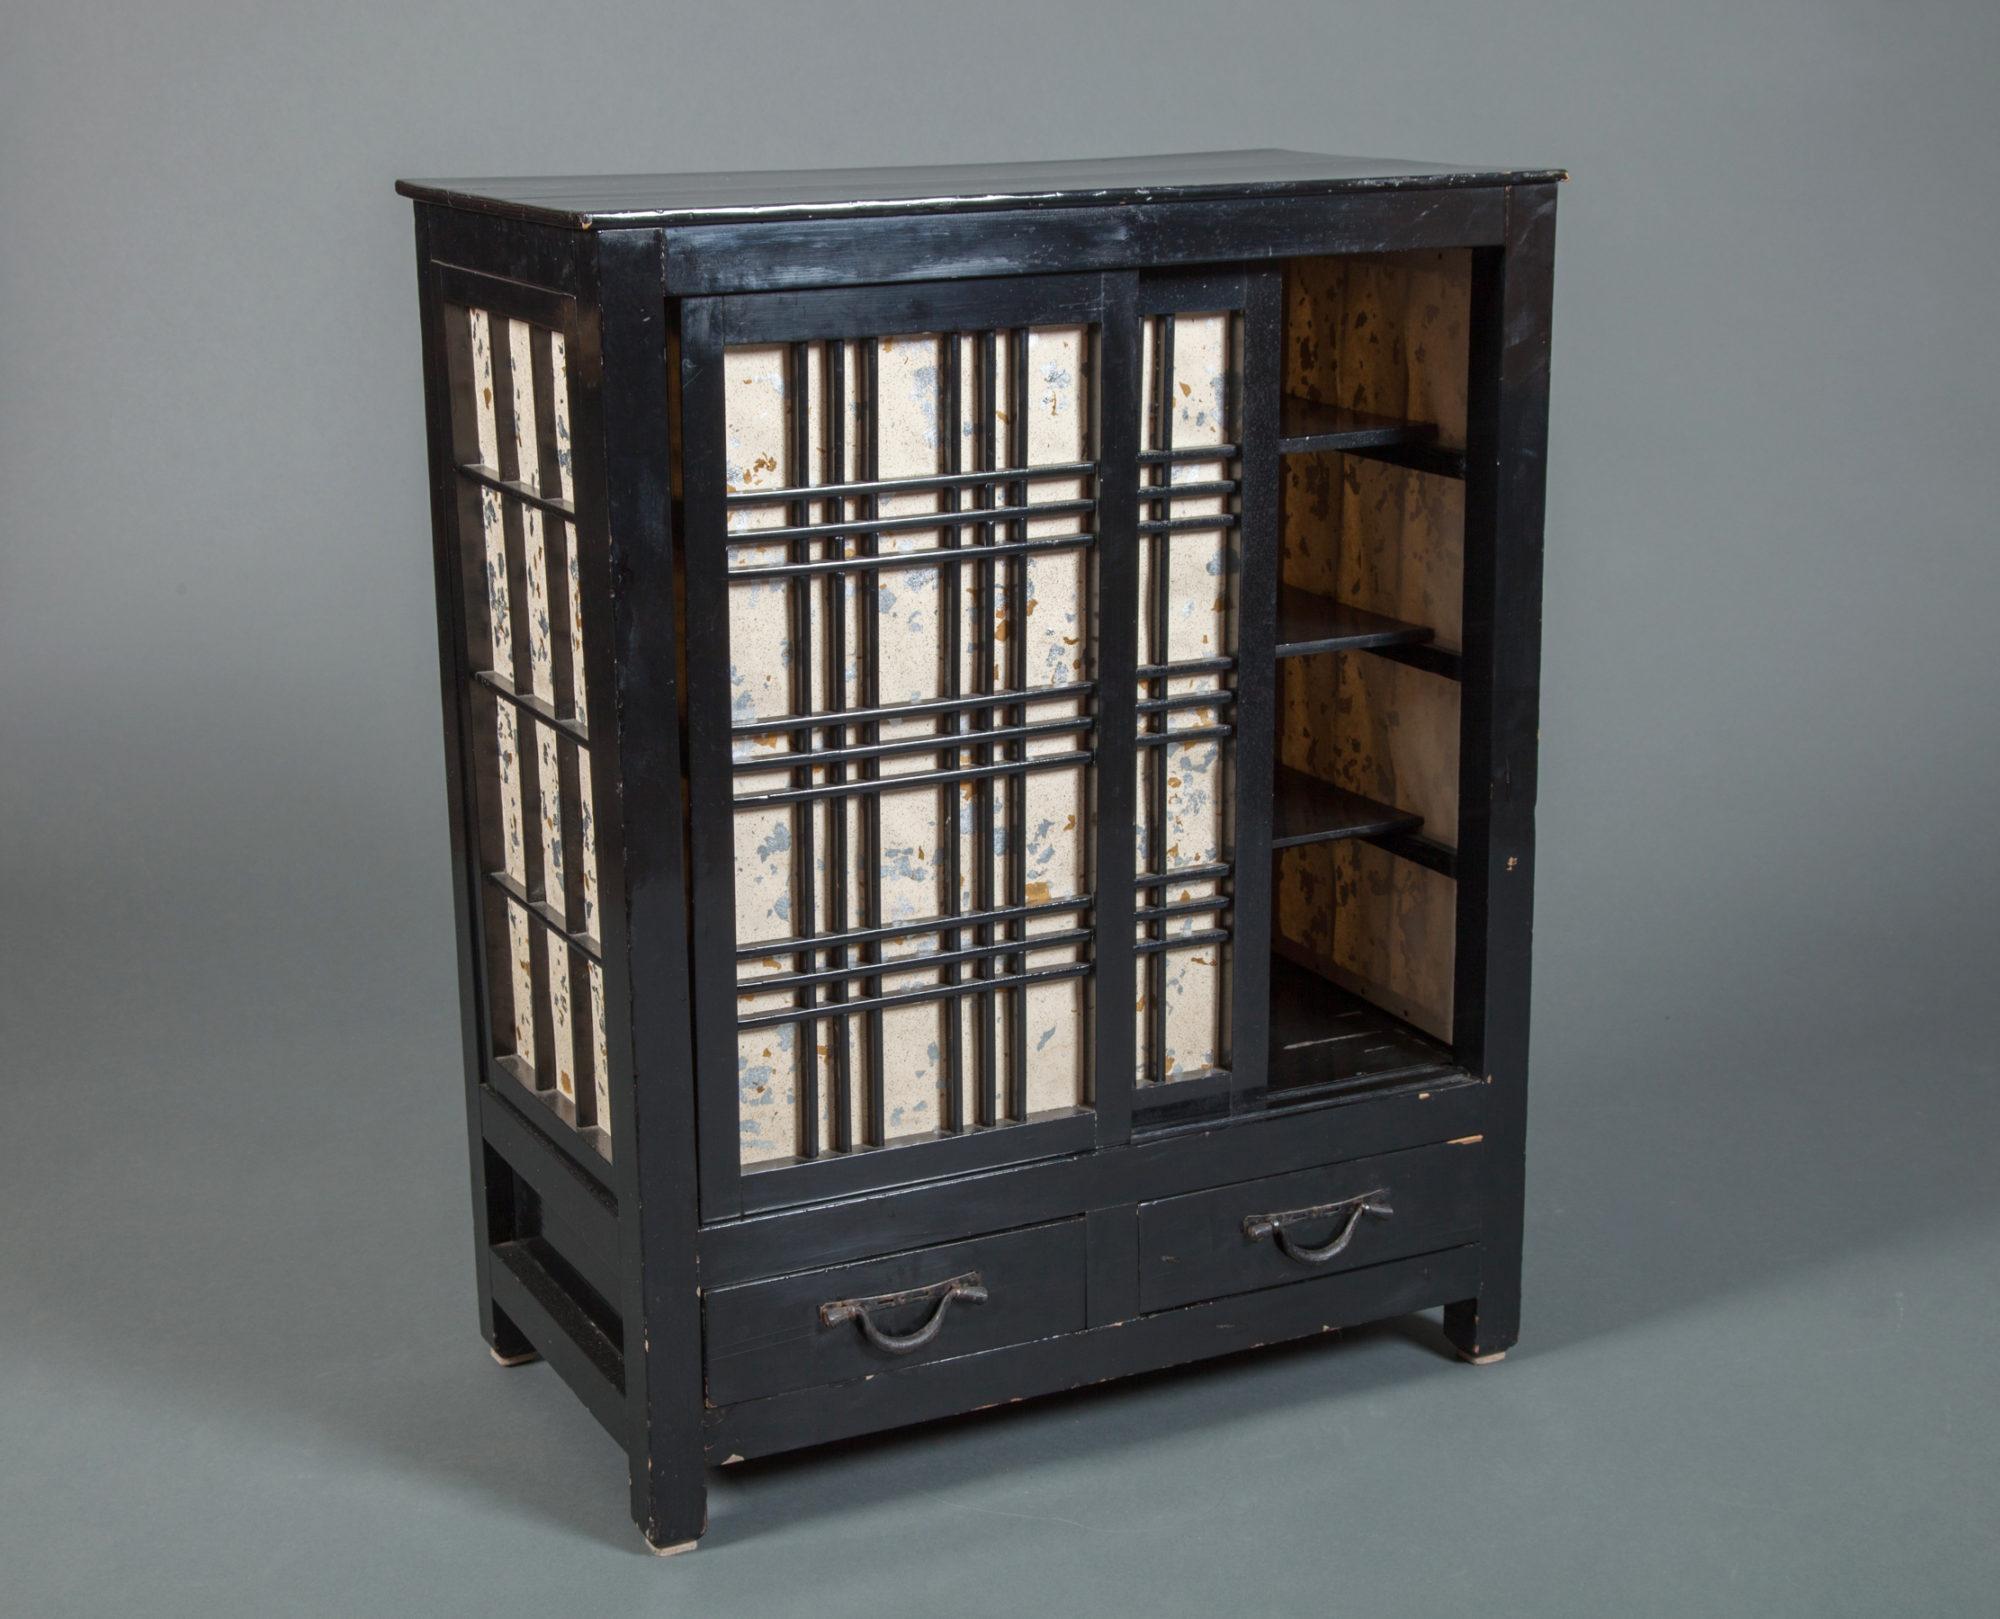 Small Japanese Cabinet with Shoji Sliding Doors